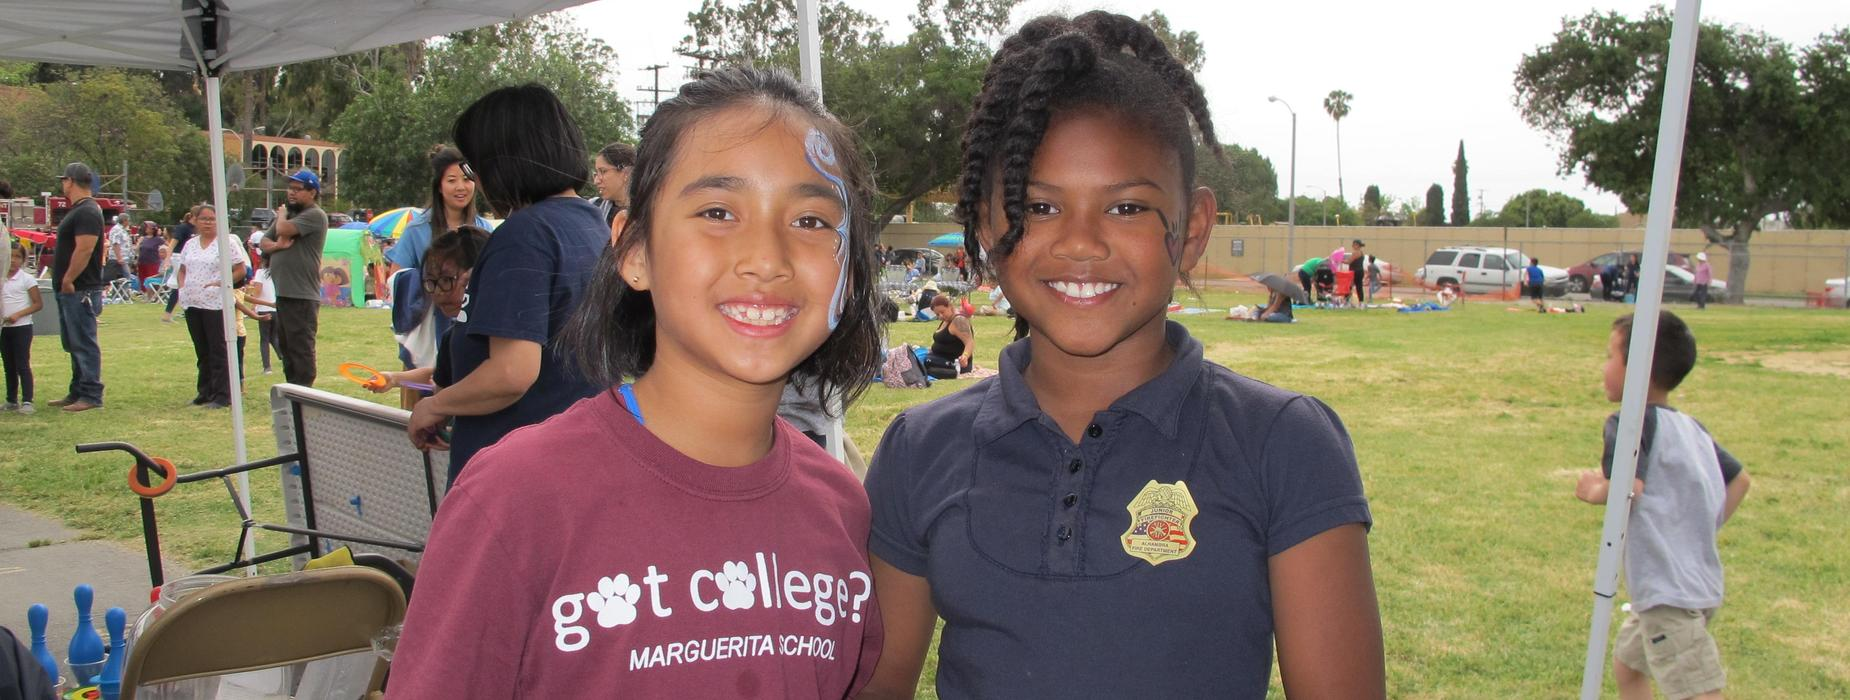 Marguerita students at Picnic Event